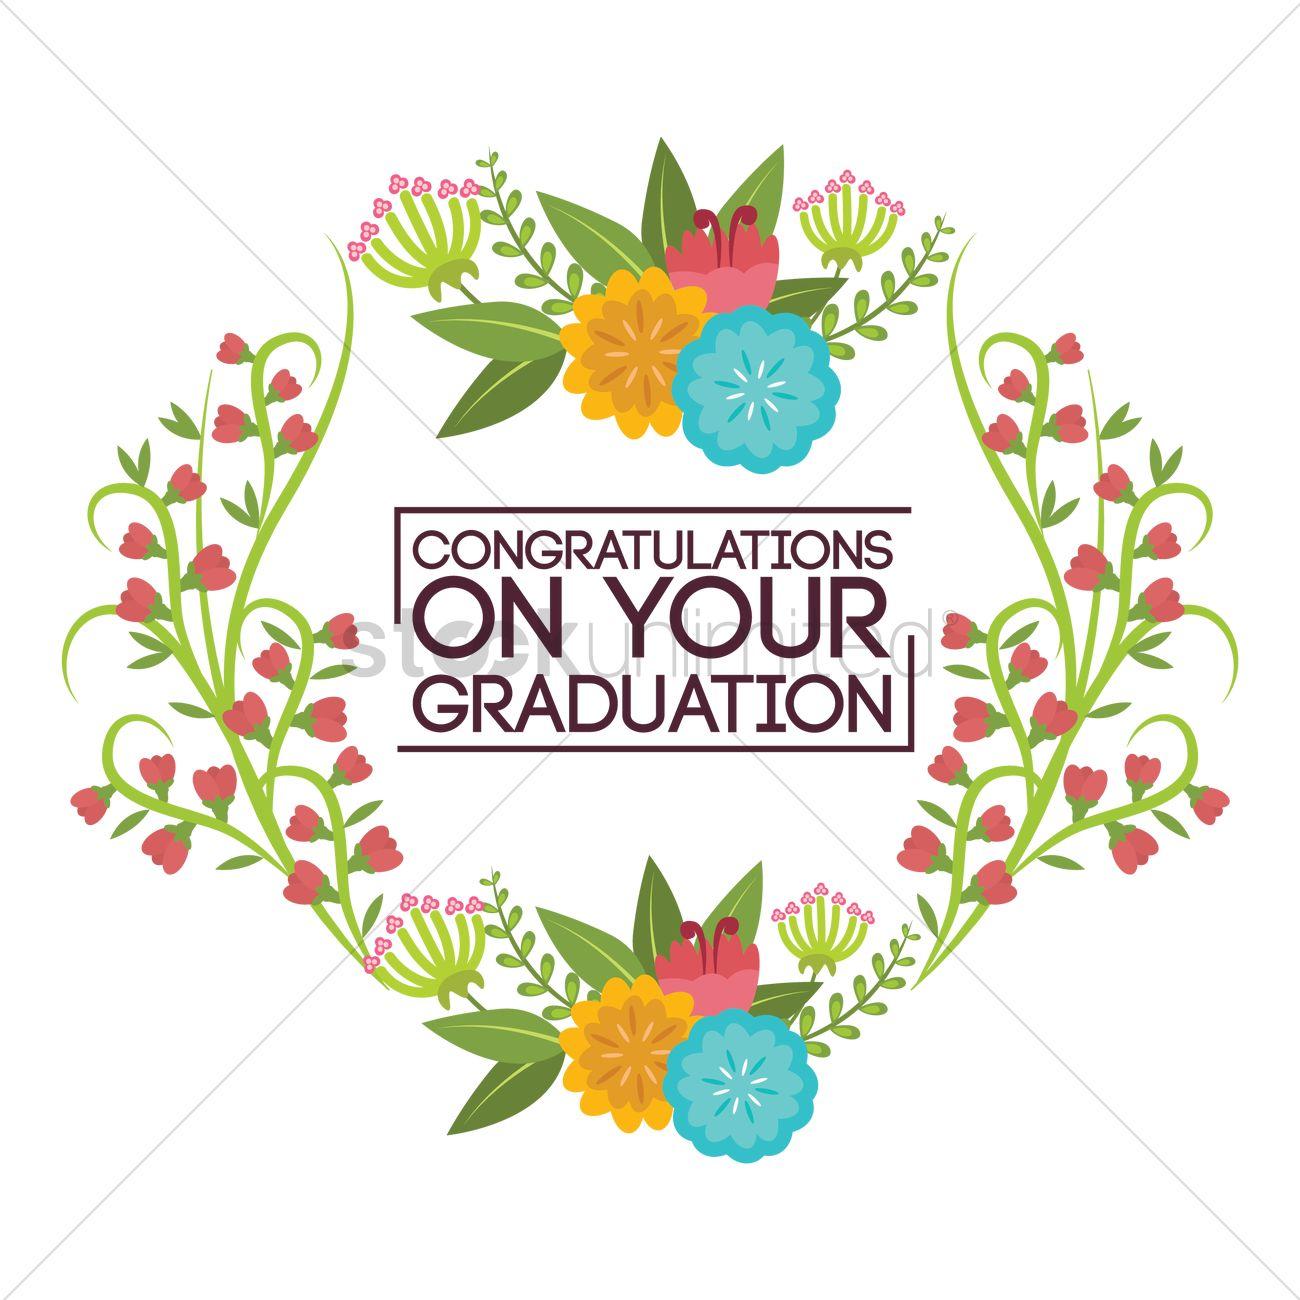 Congratulations on your graduation Vector Image - 1797280 ...